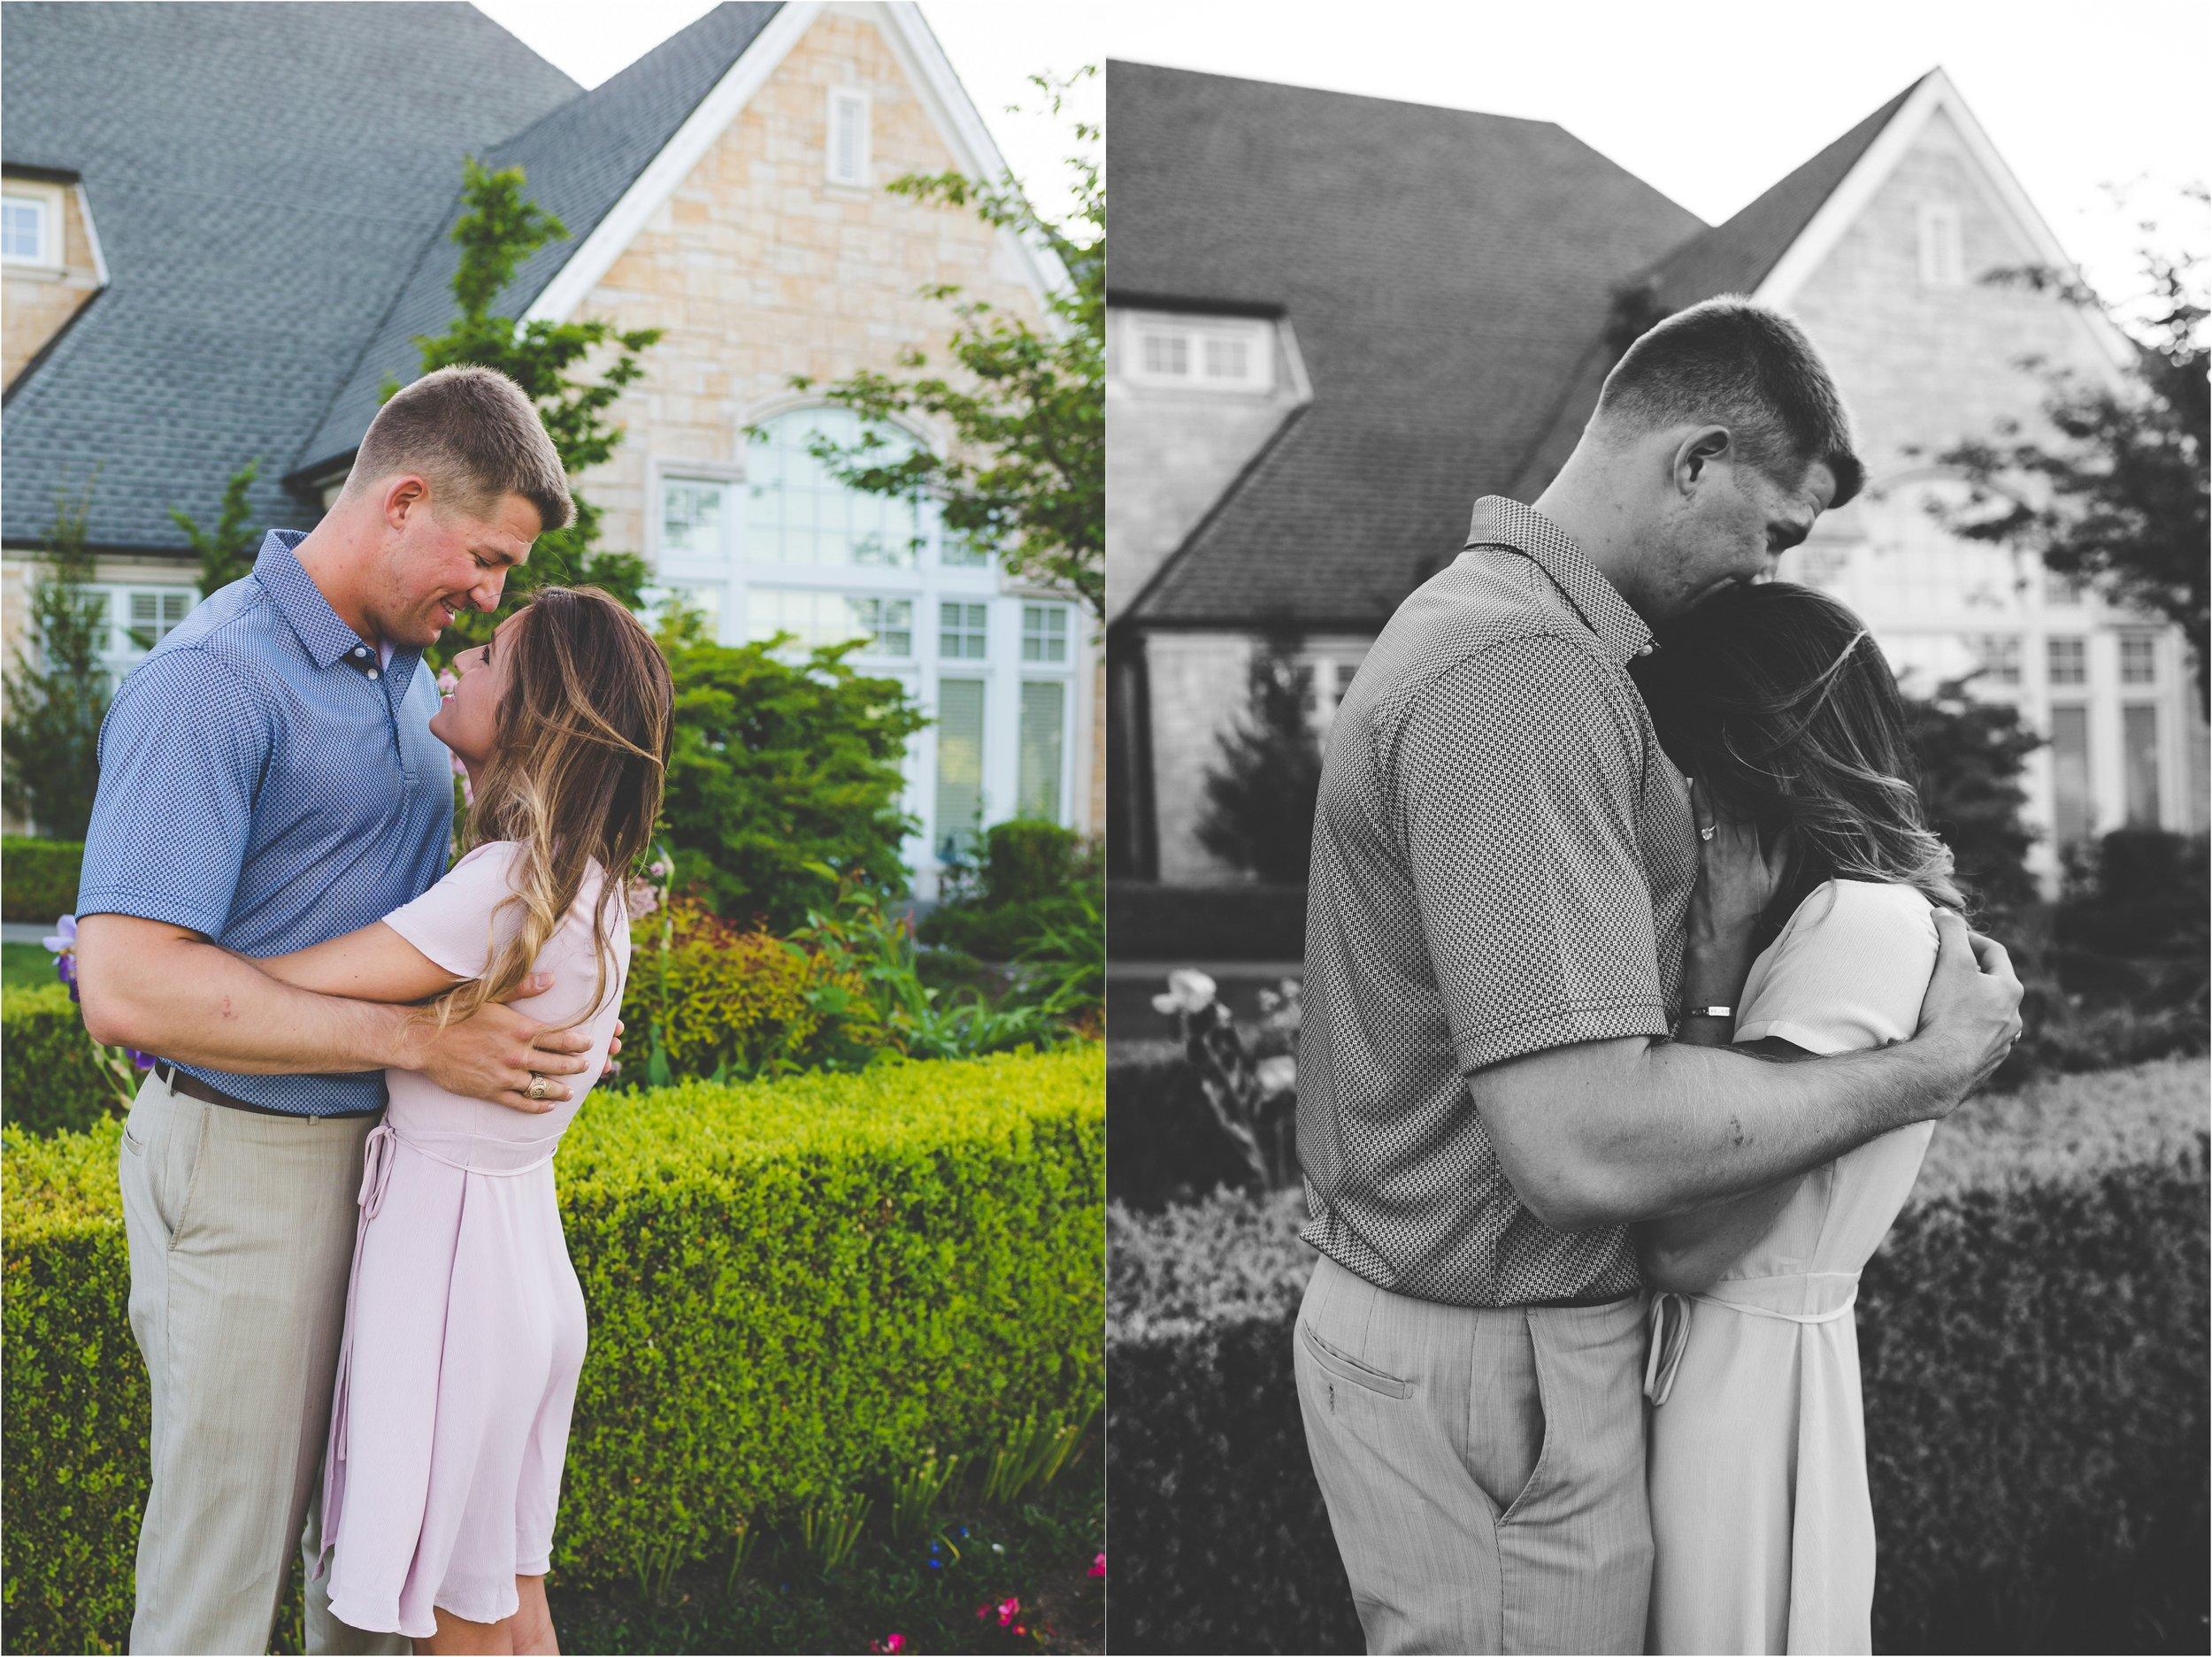 newcastle-golf-club-proposal-jannicka-mayte-seattle-washington-engagement-wedding-photographer_0044.jpg